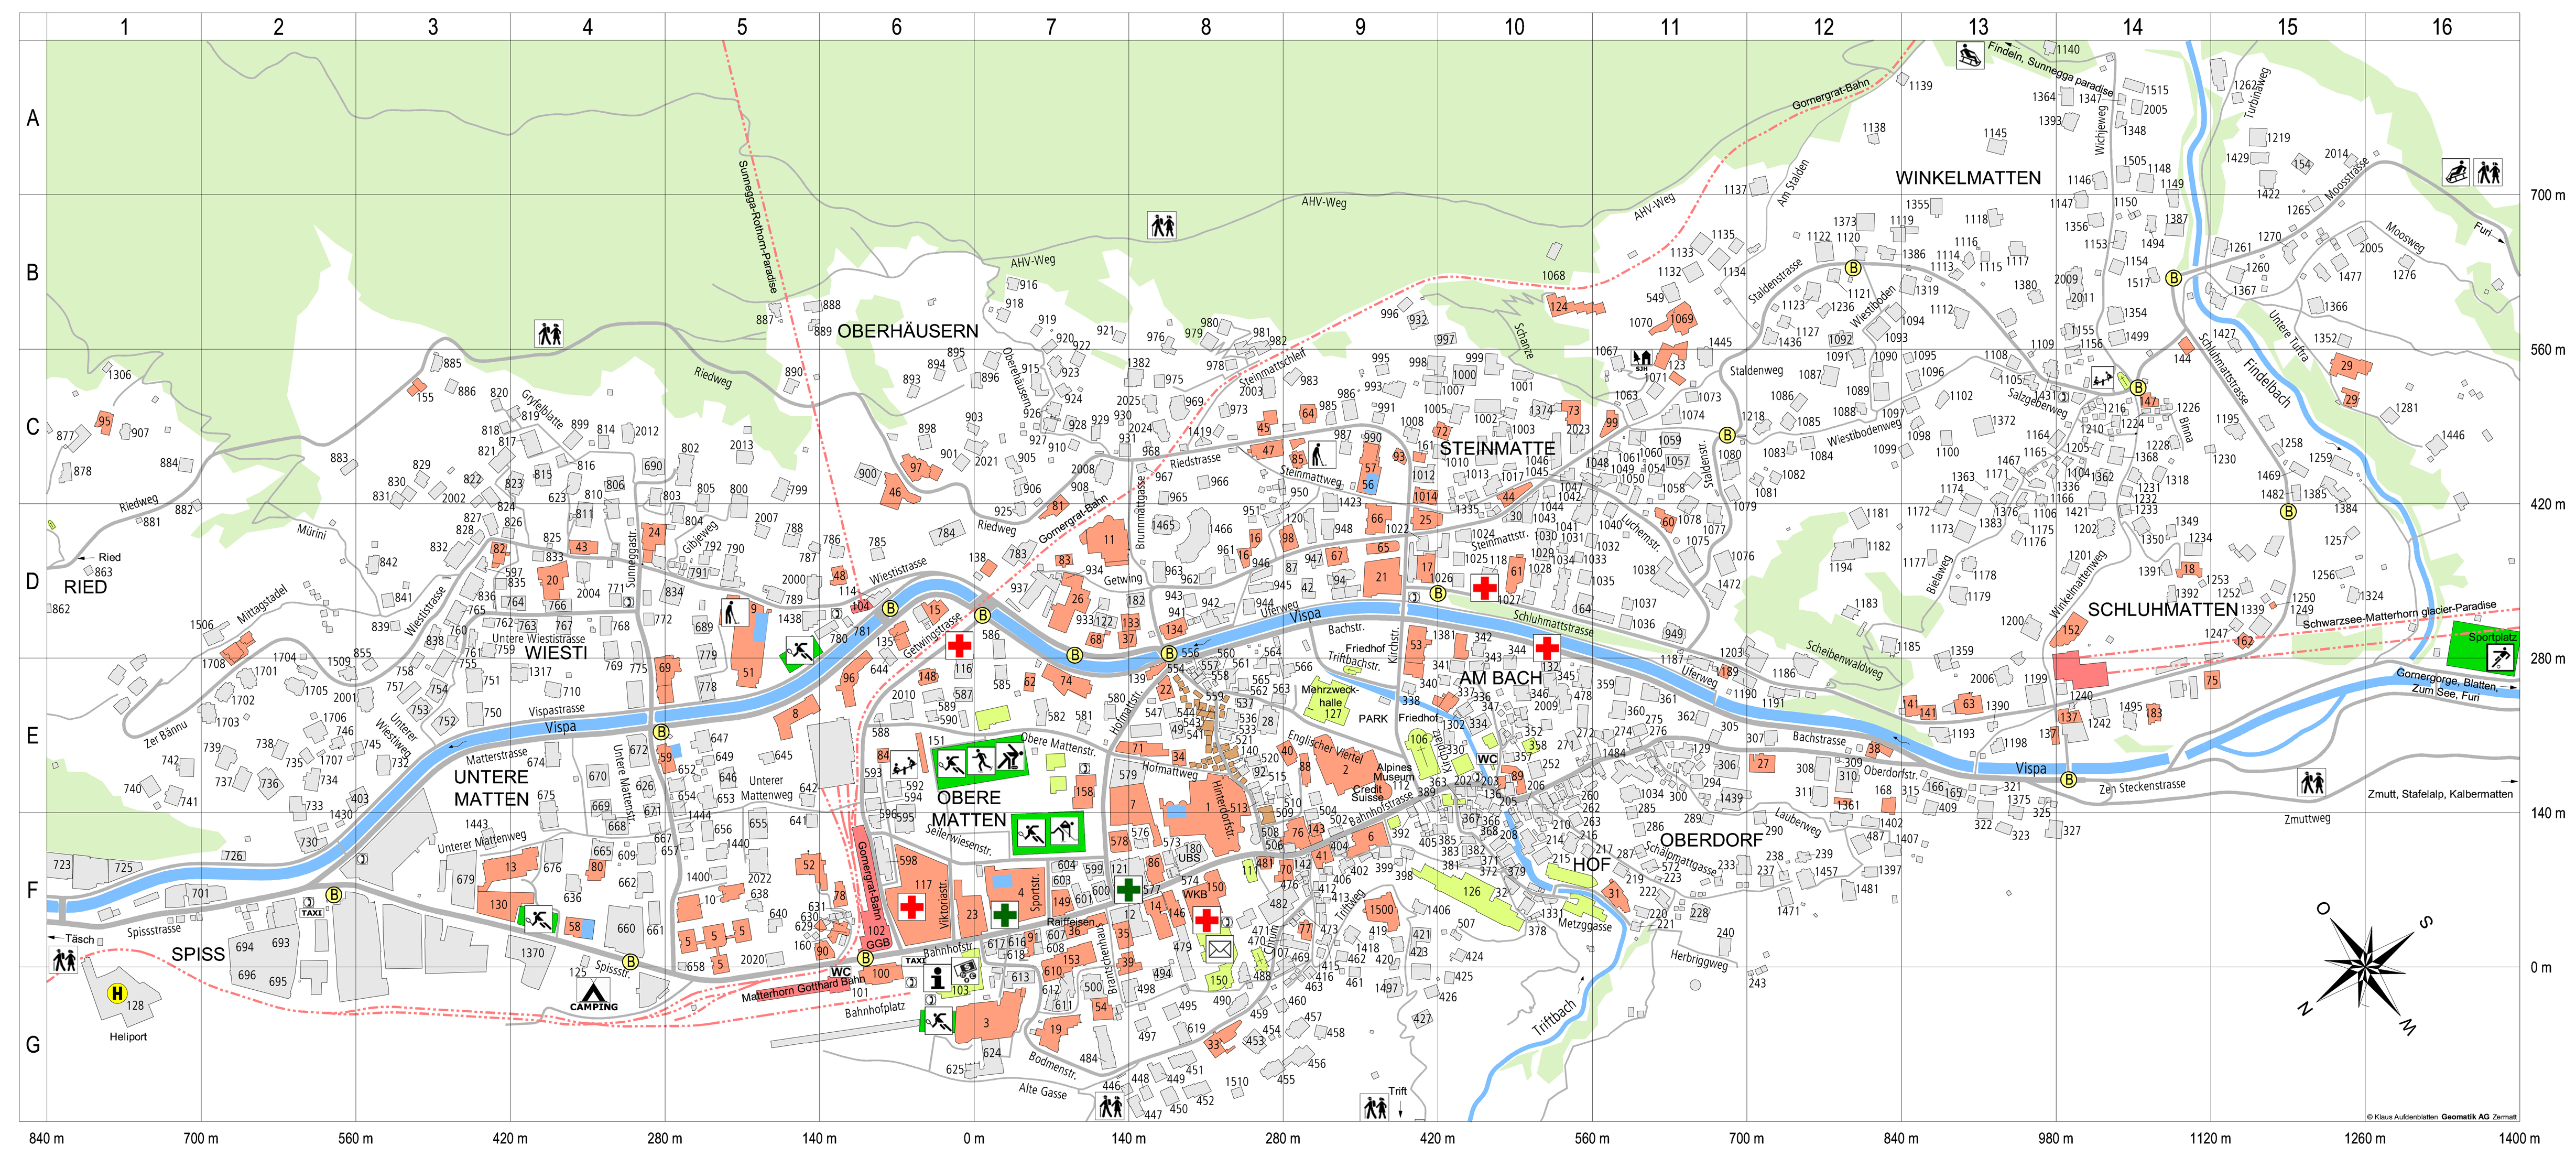 Zermatt tourist map see map details from epic paceinteractive com